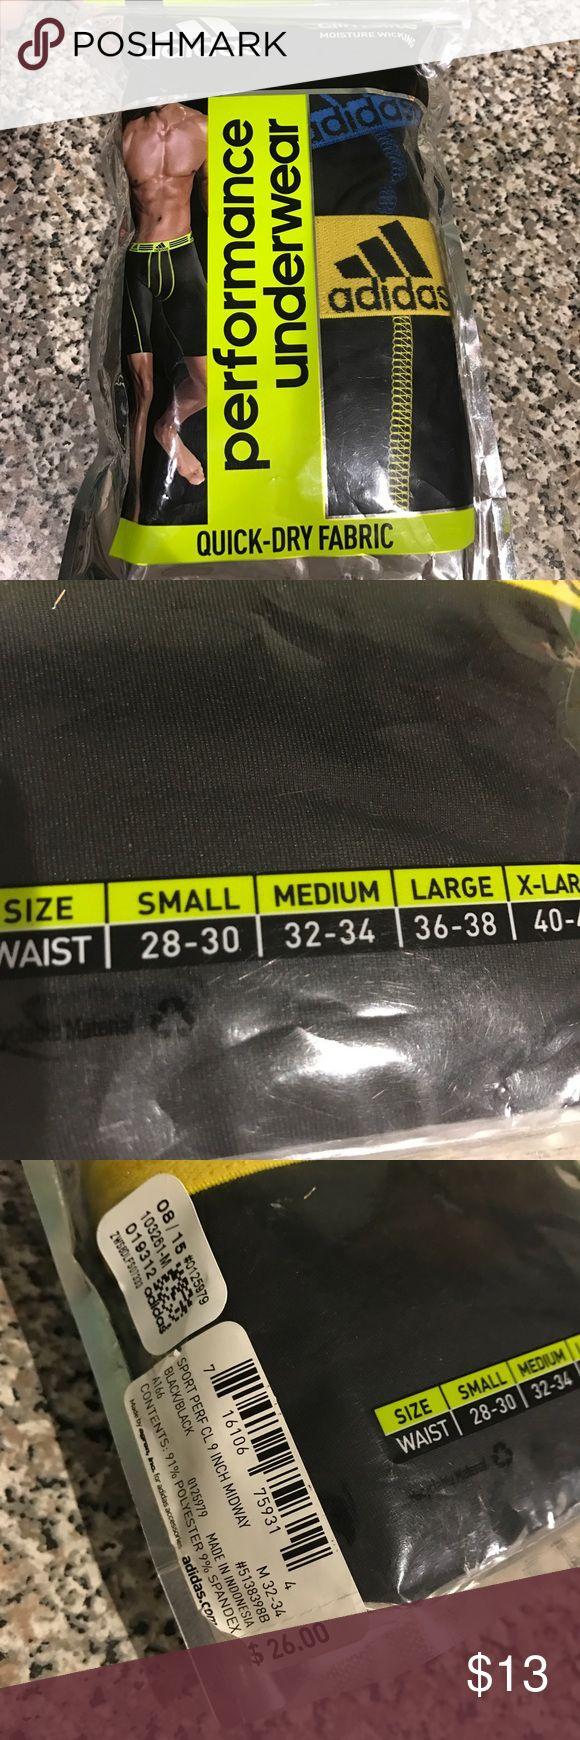 Adidas performance men's underwear Brand new, in packaging Adidas Underwear & Socks Boxers